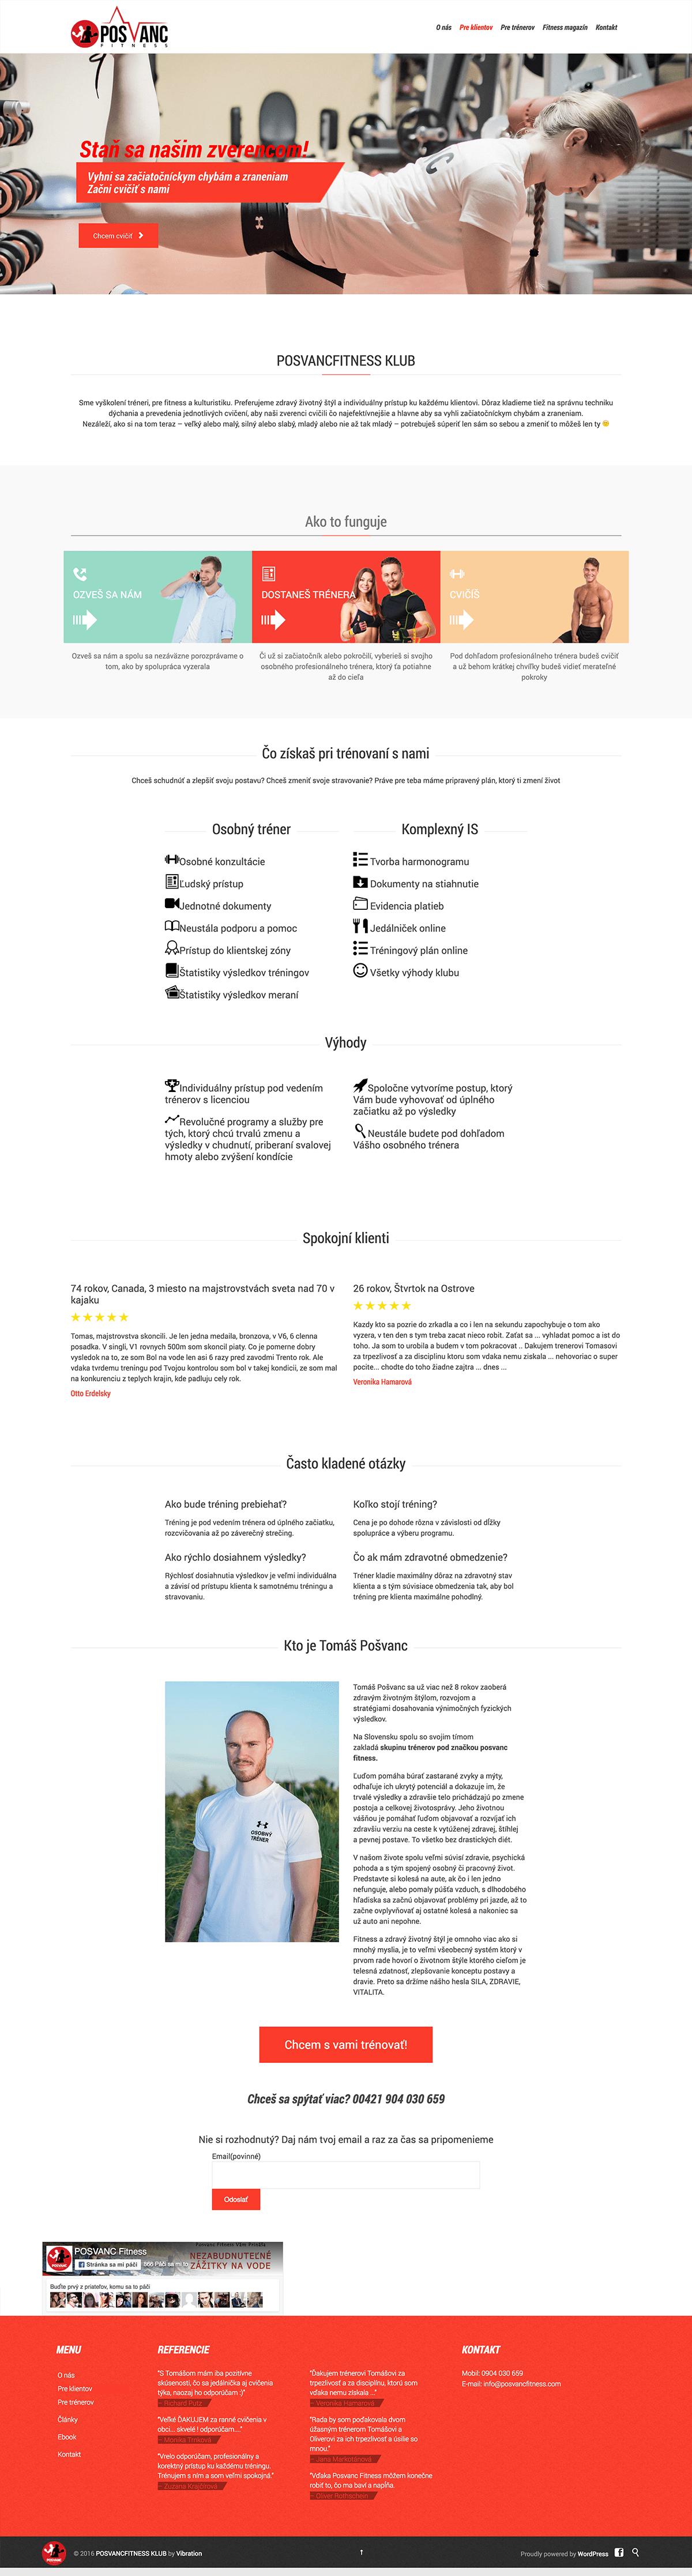 Pre klientov – Posvancfitness.com copy